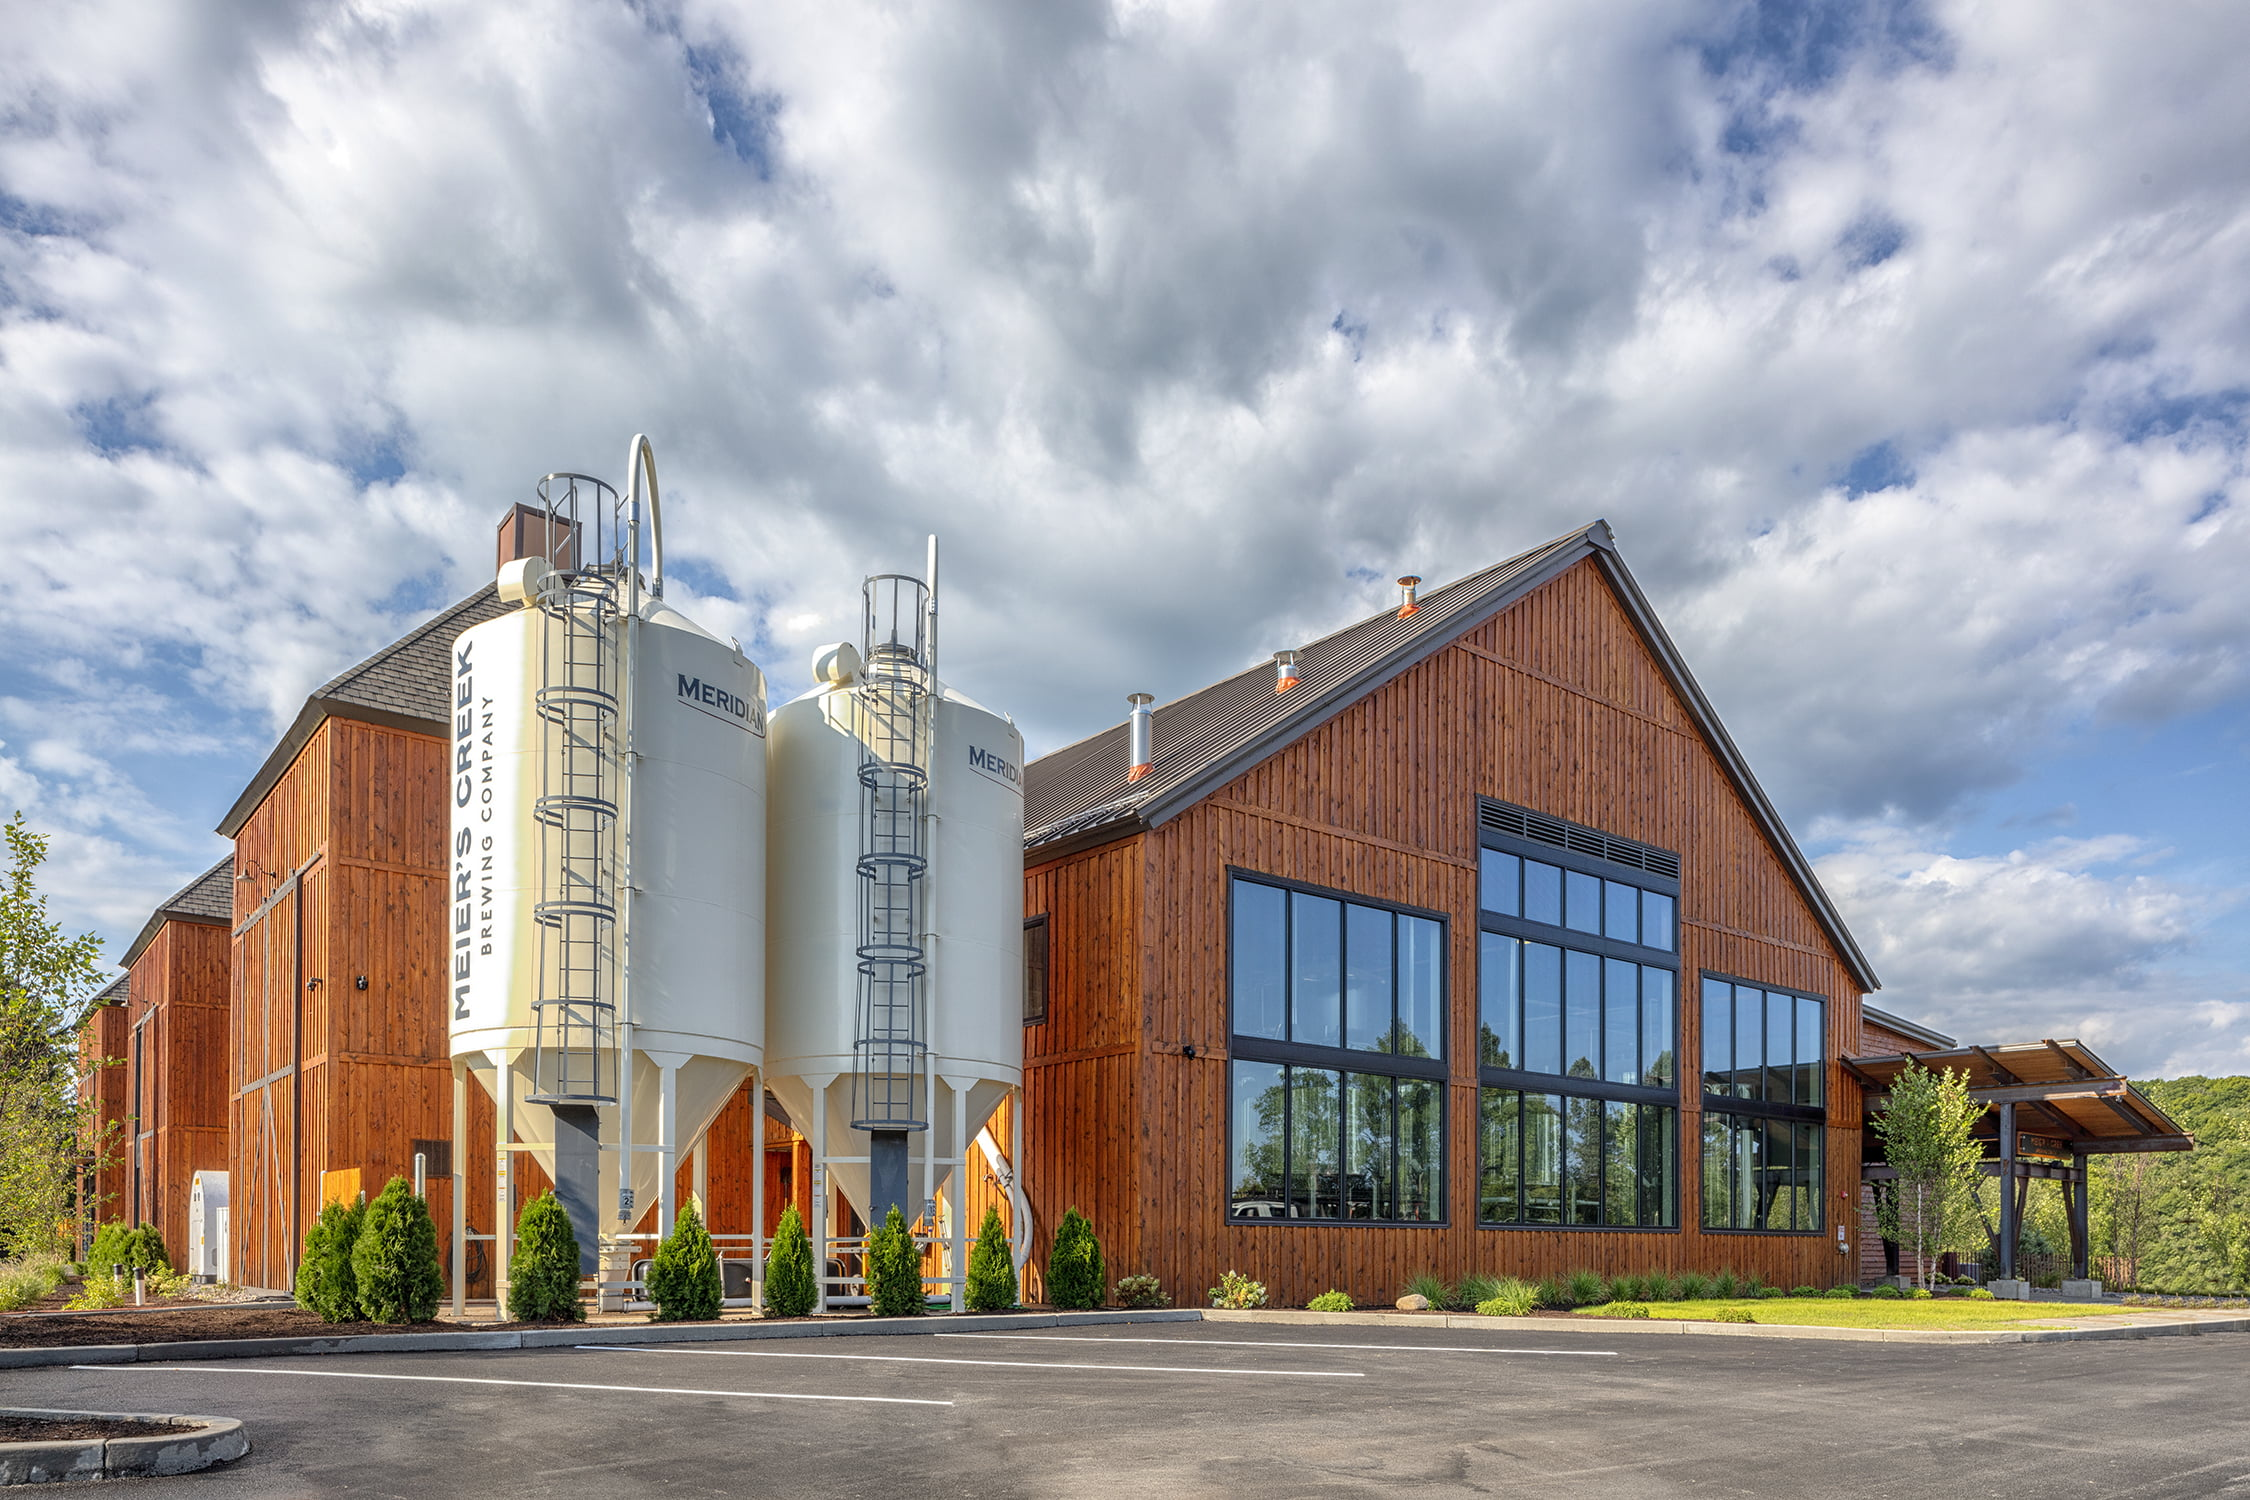 Meier's Creek Brewing Company is open for business!